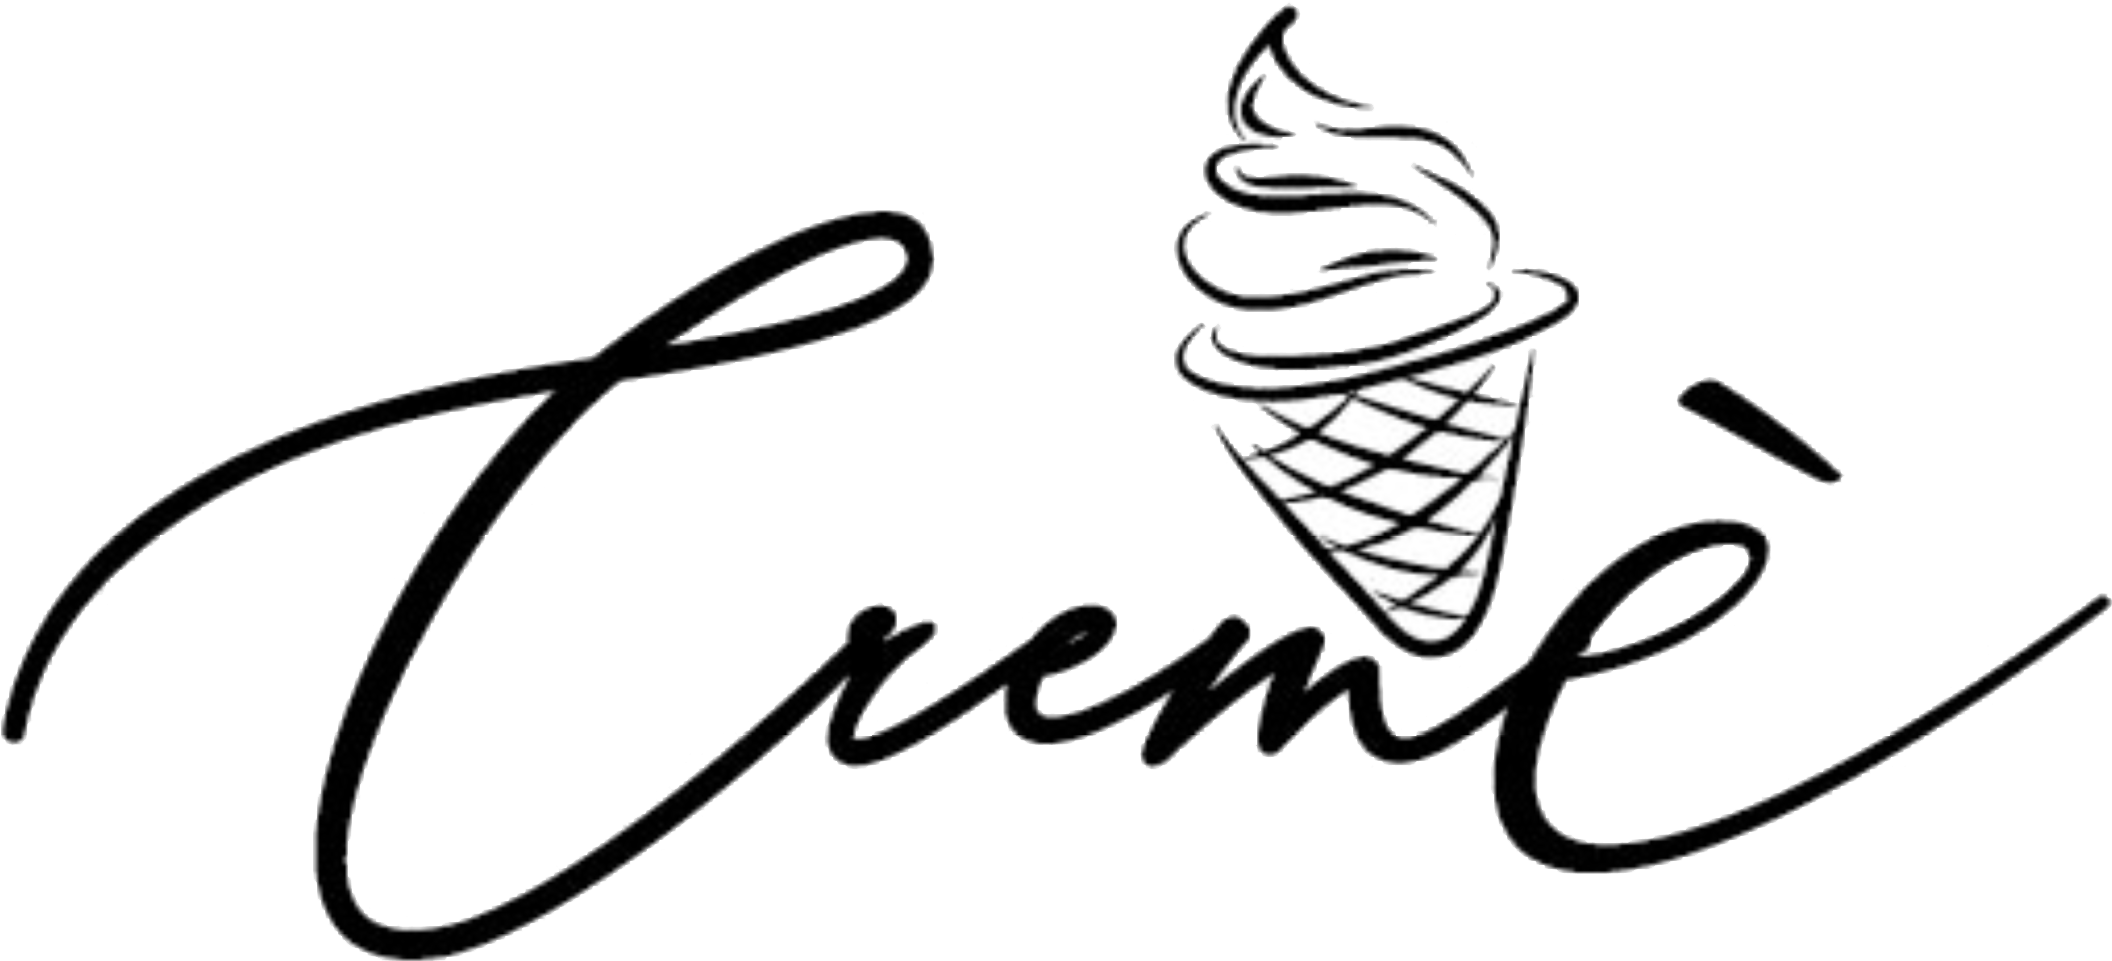 Cremè - 意式冰淇淋店